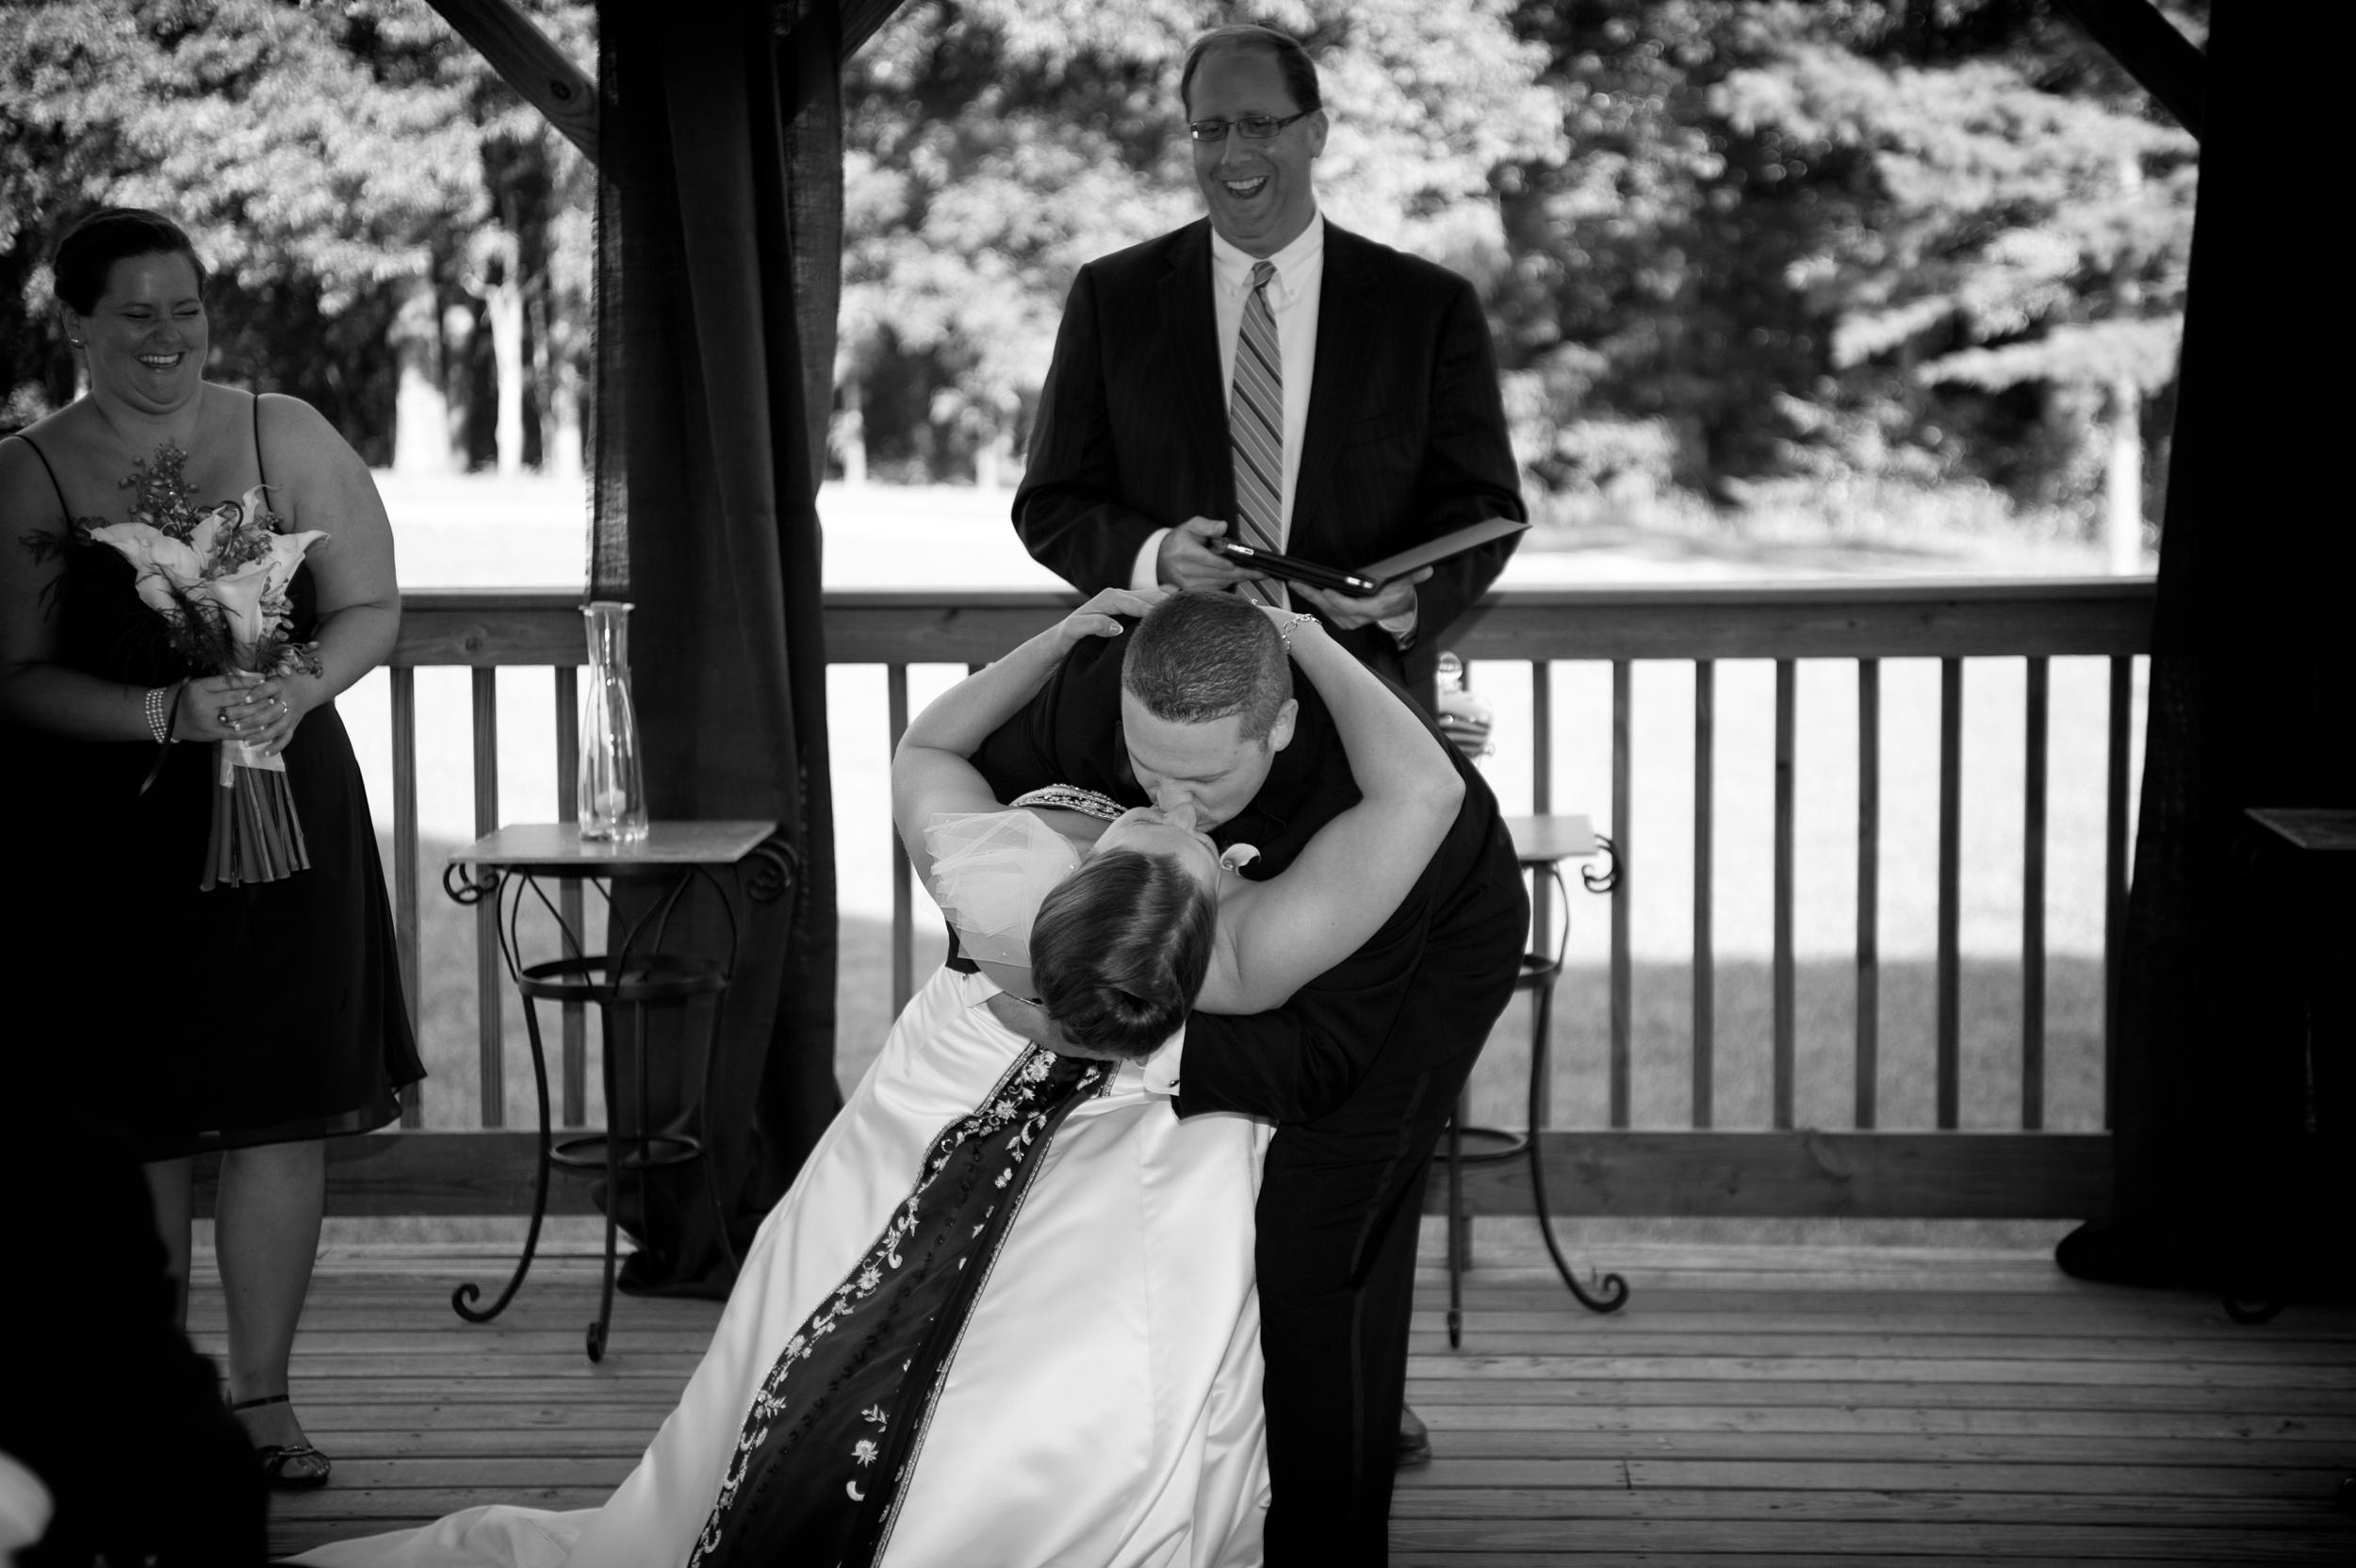 Bride and Groom Kiss at Winery